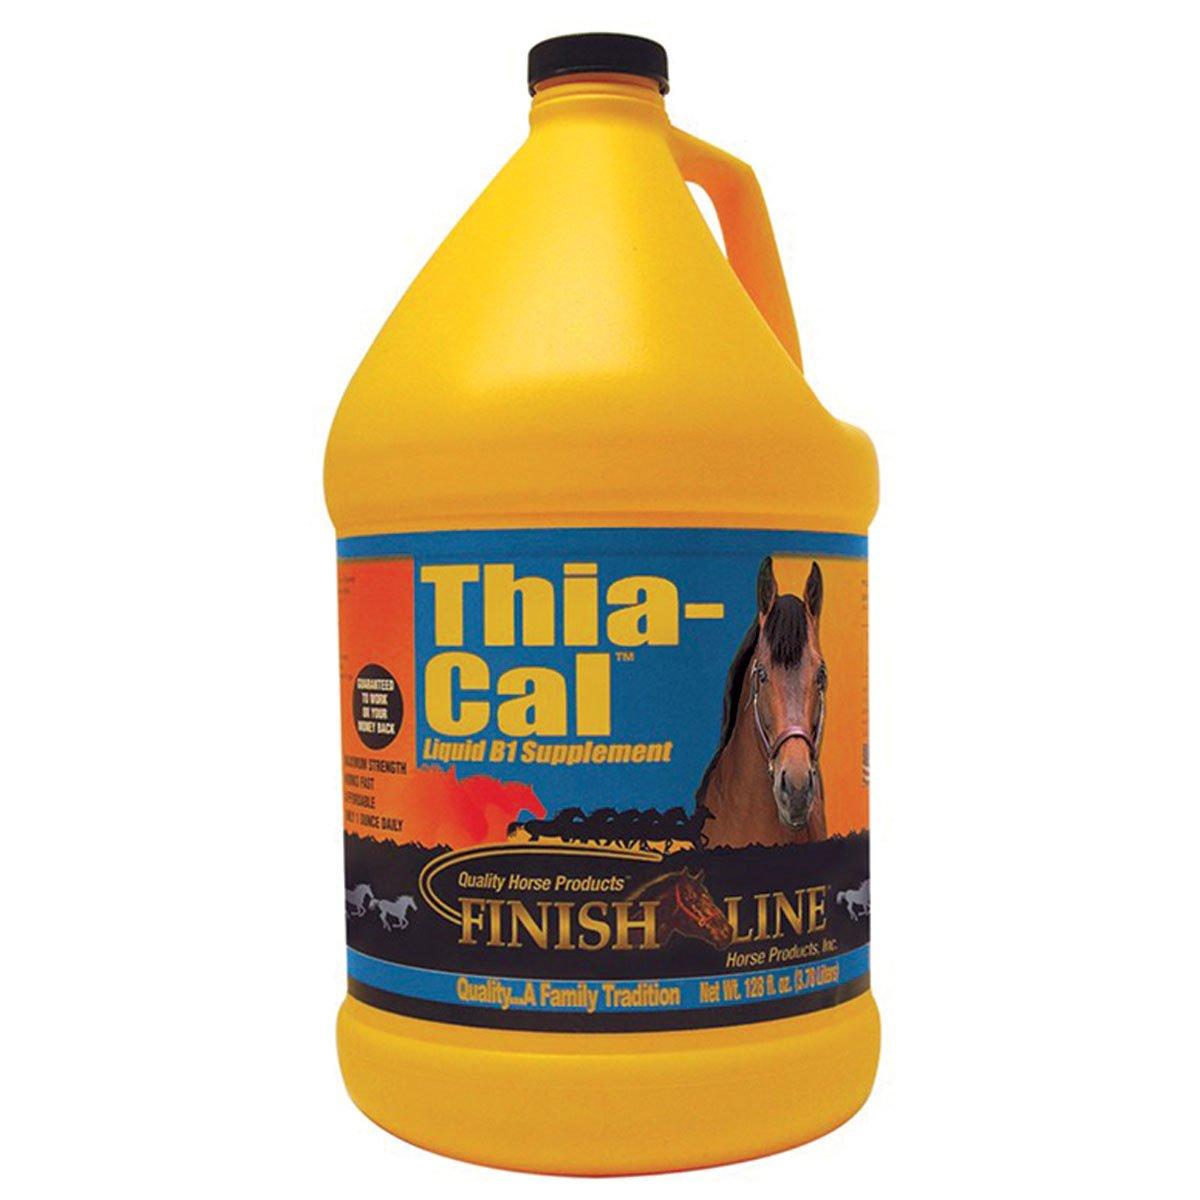 Finish Line Horse Products Thia Cal (Gallon)